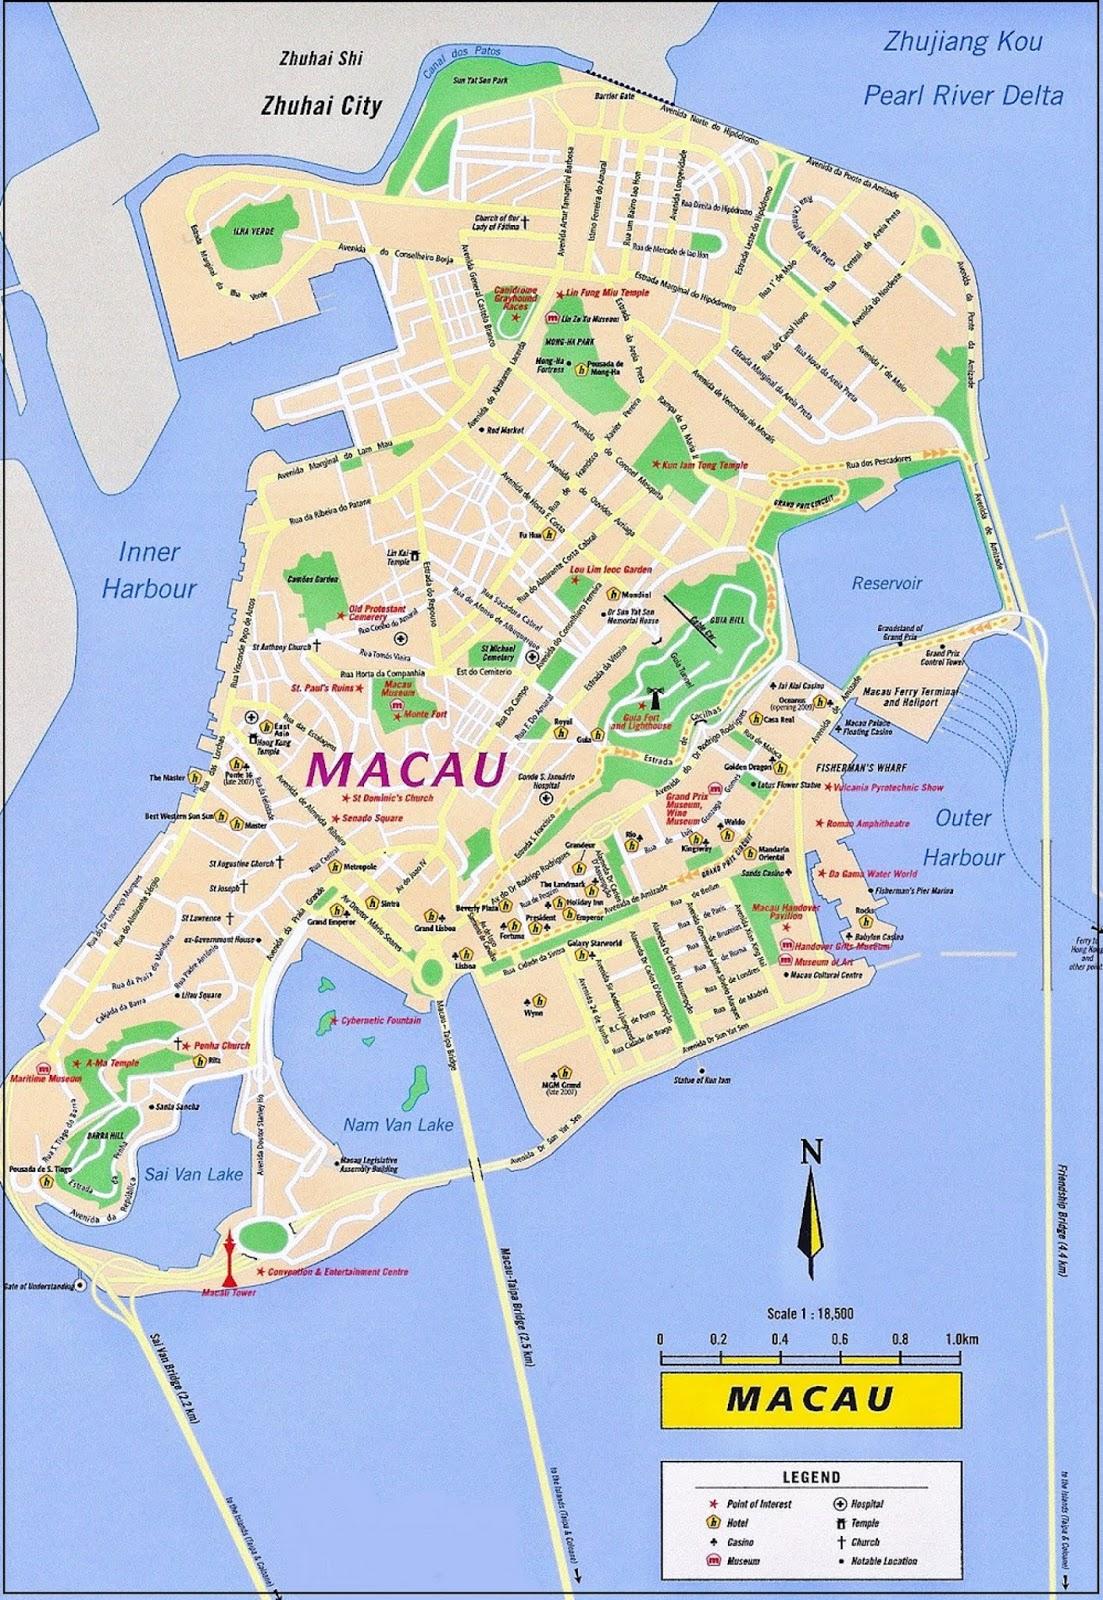 Peta Negara Makau